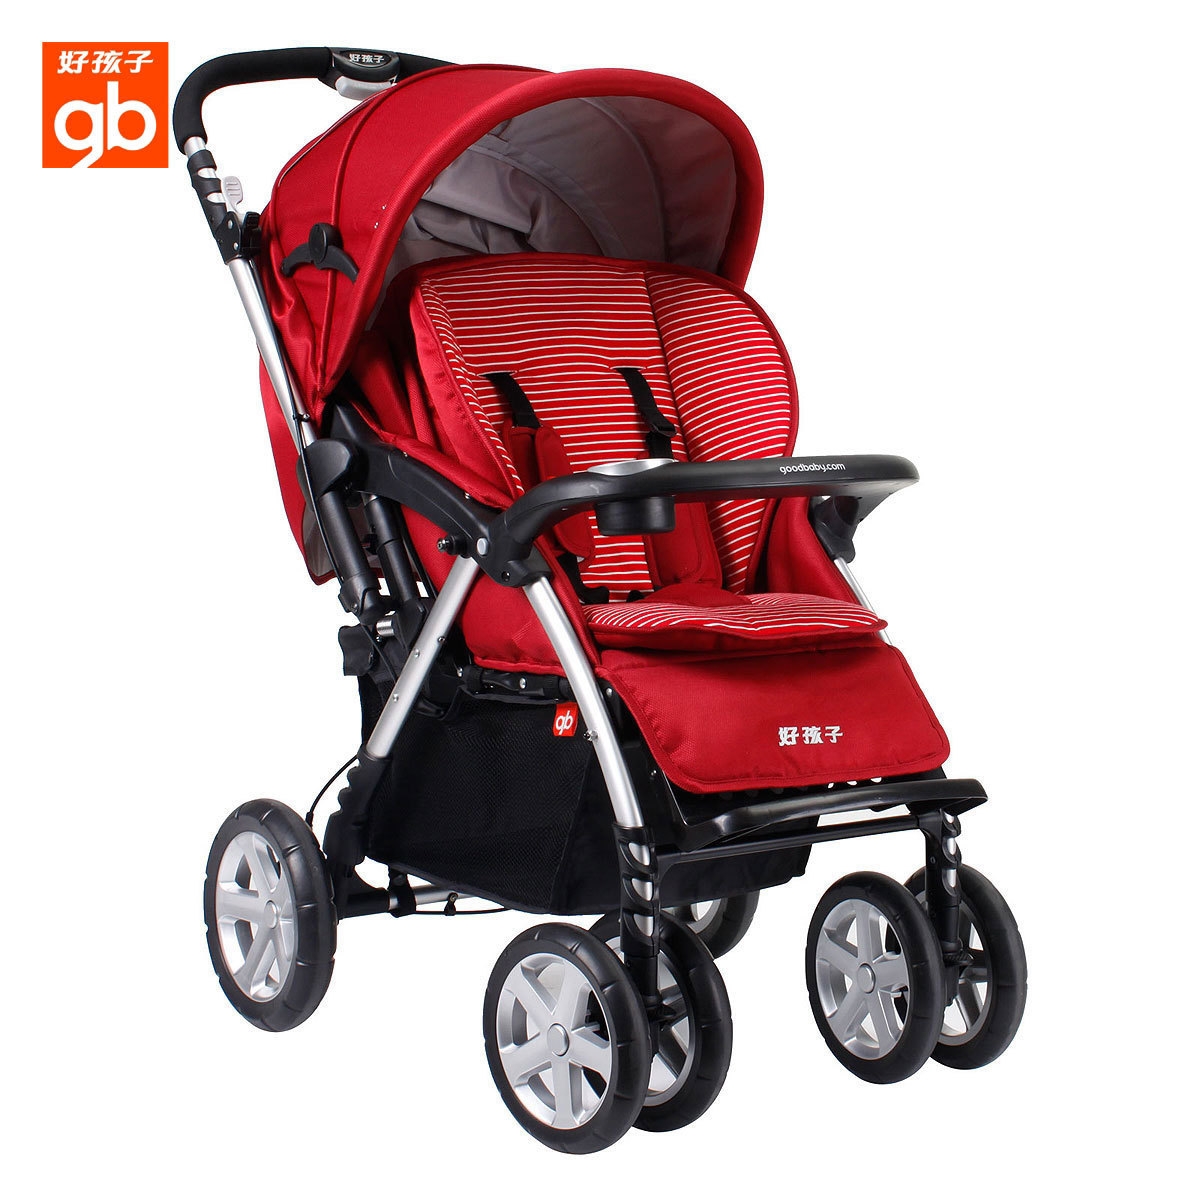 Aliexpress.com : Buy World famous brand gb baby stroller C980H ...